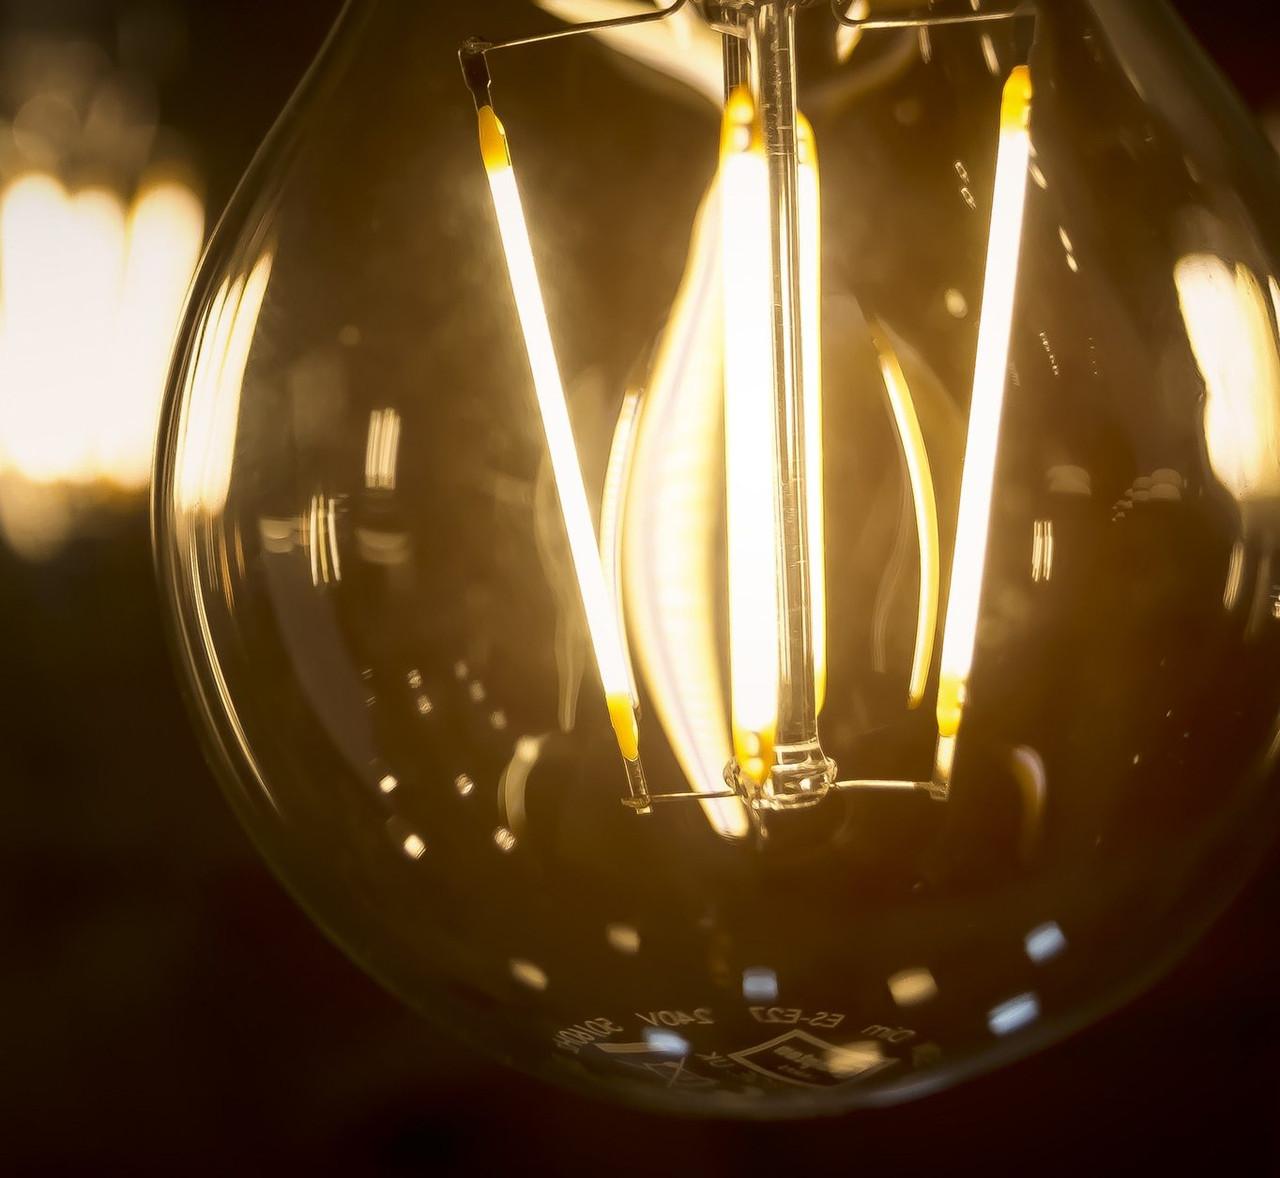 LED GLS 100W Equivalent Light Bulbs